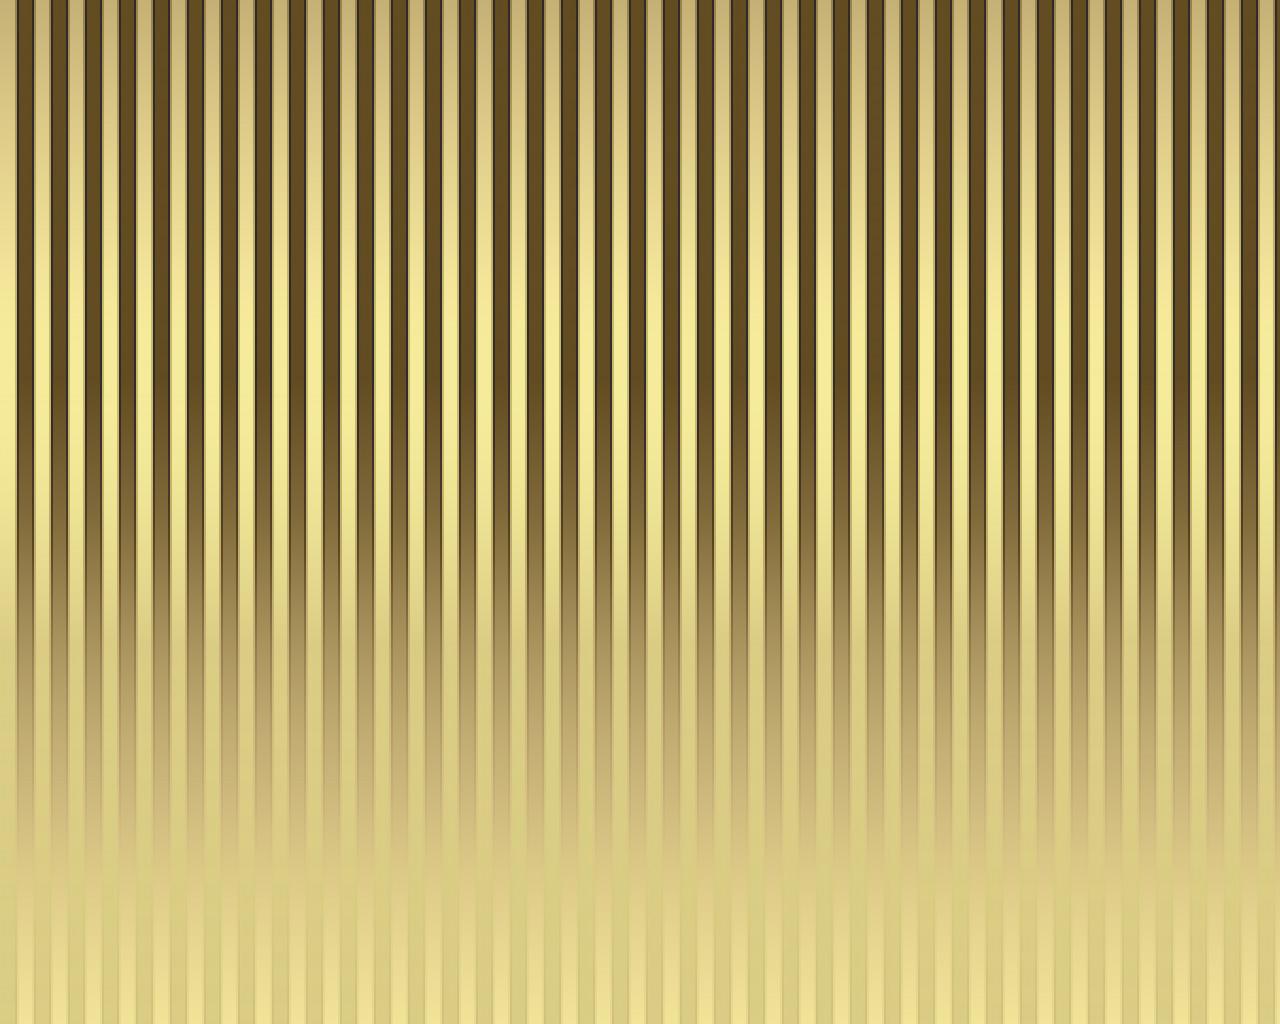 Blue Stripe Wallpaper: Gold And Navy Wallpaper